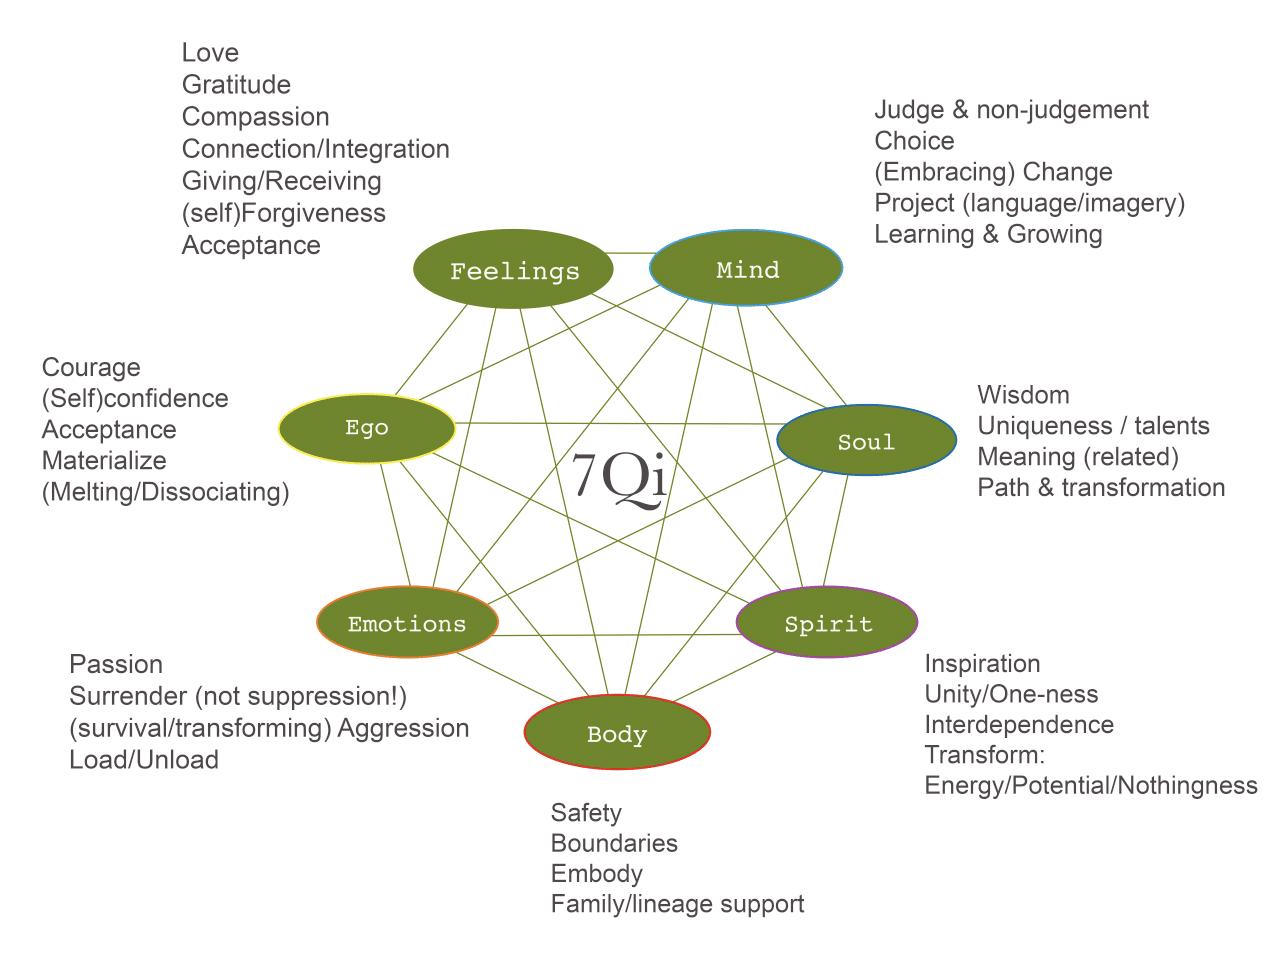 7Qi core competences